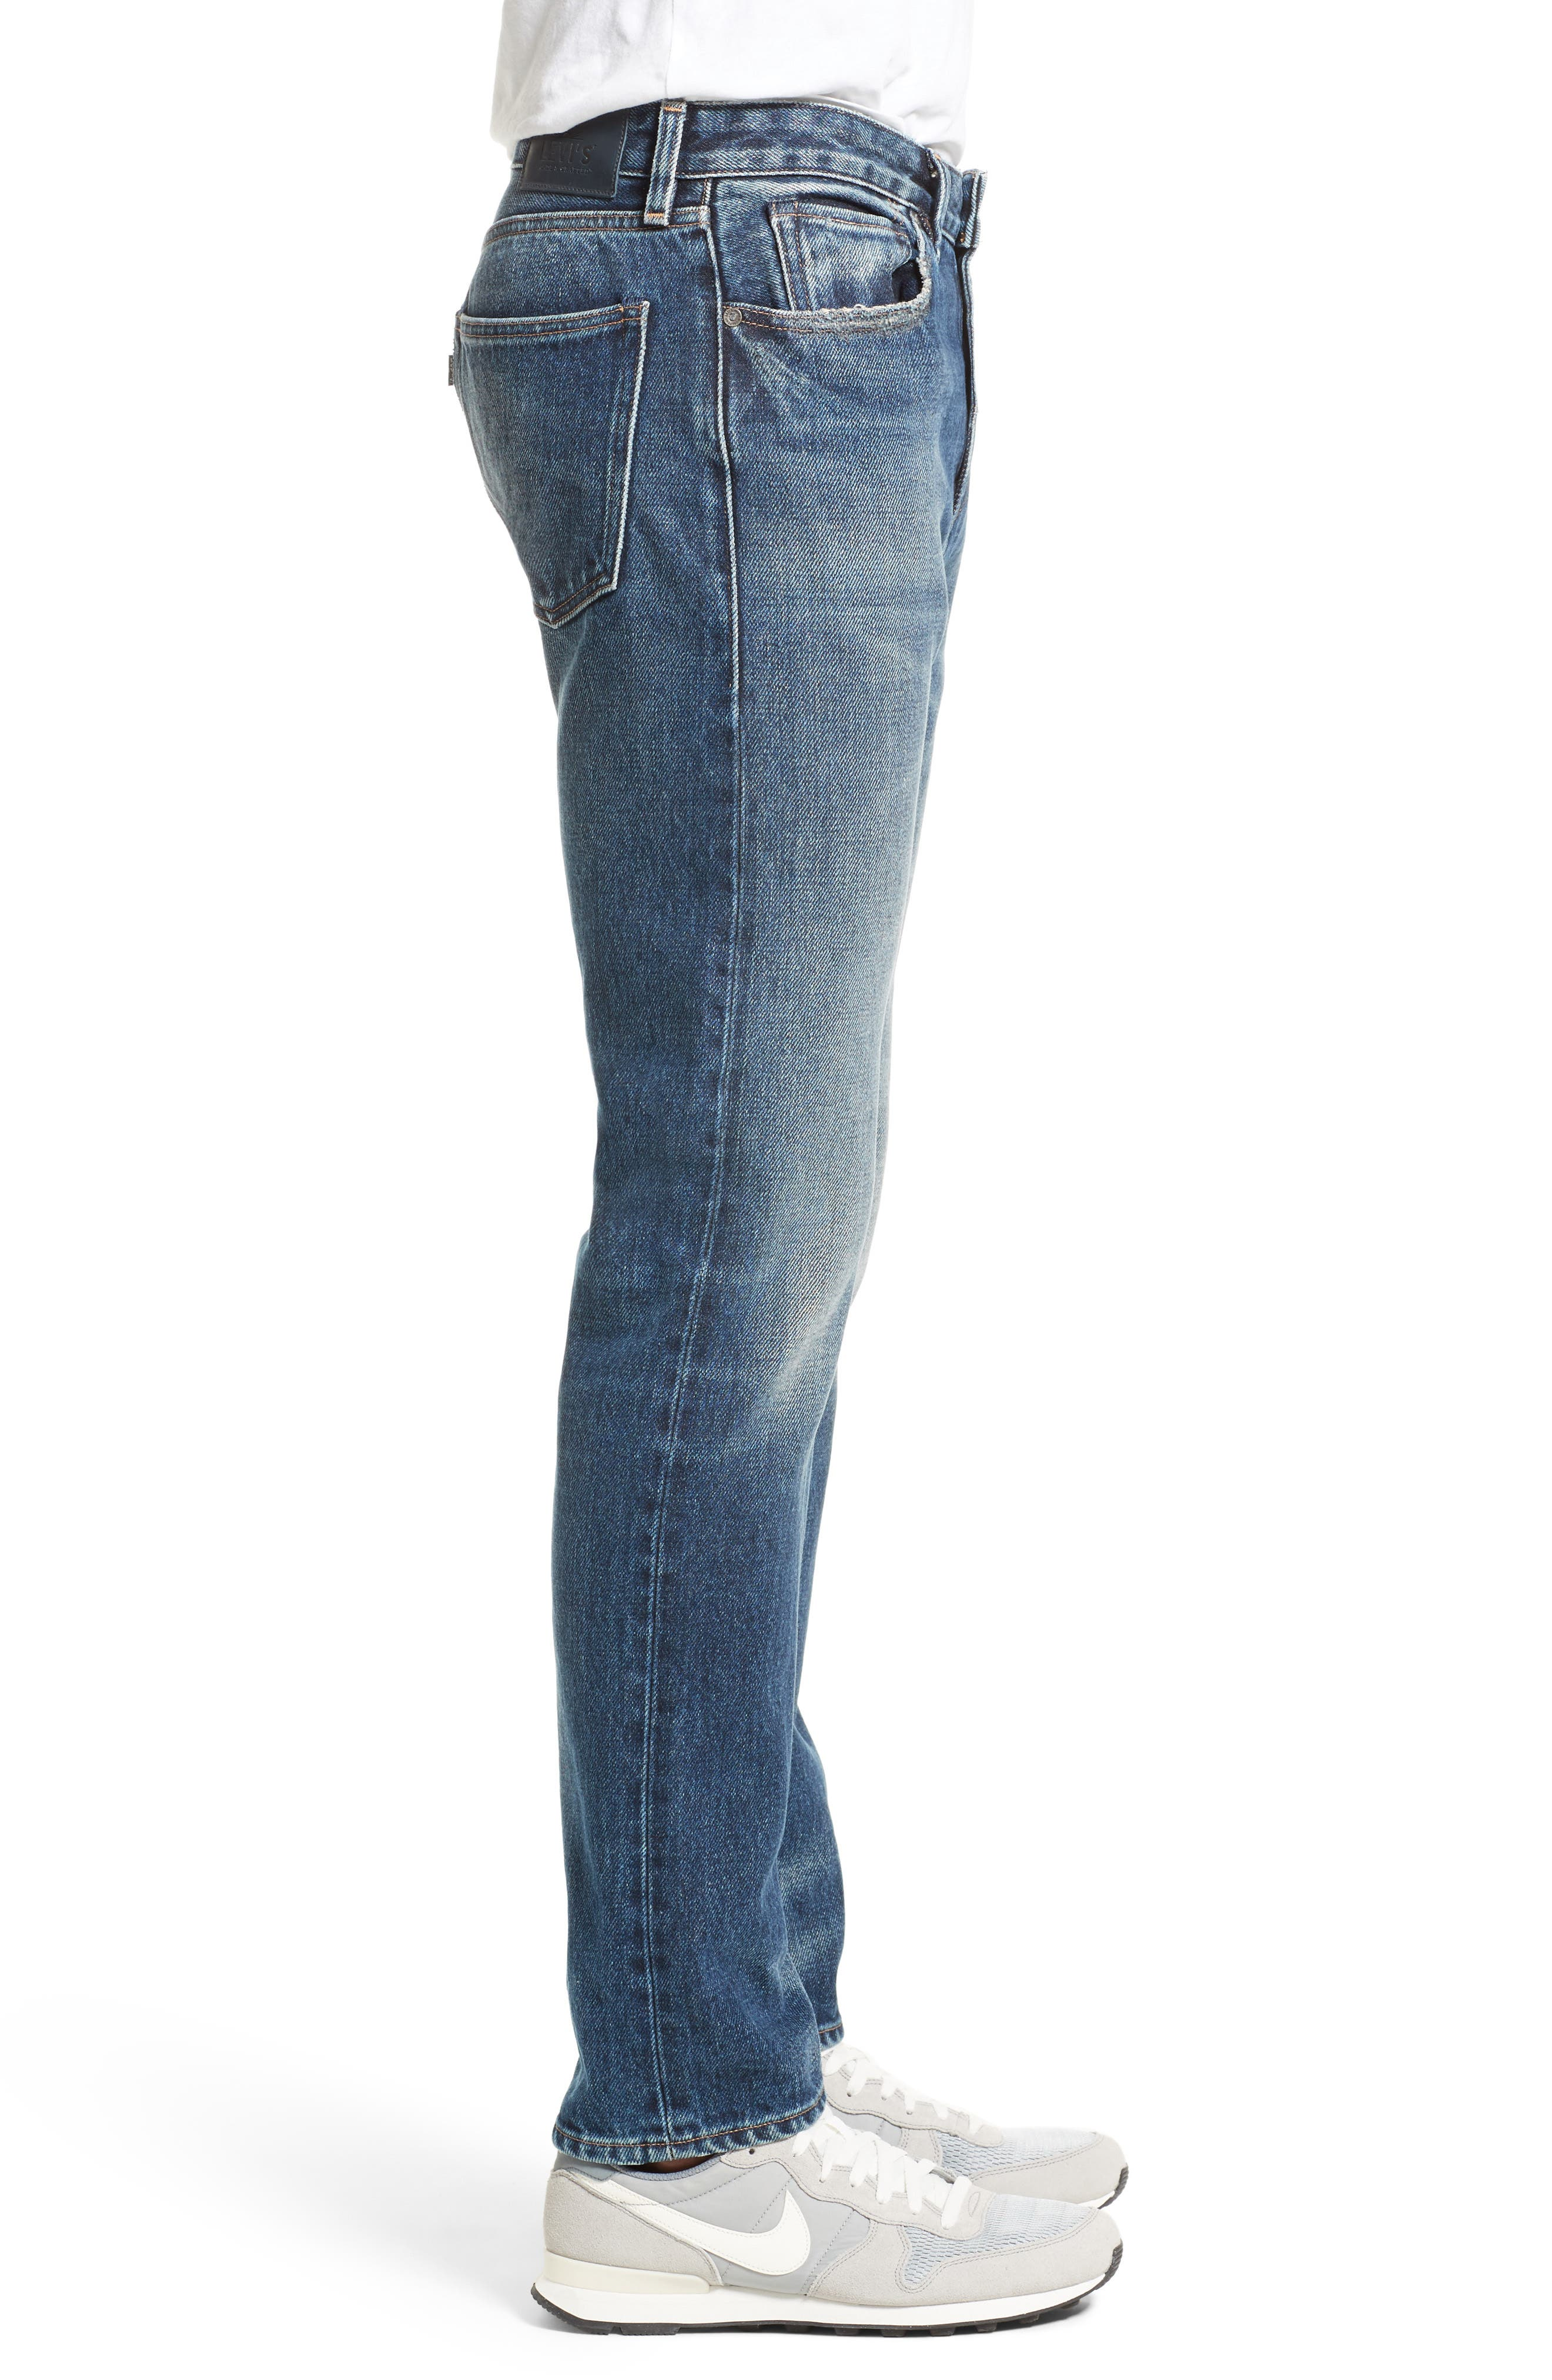 Tack Slim Fit Jeans,                             Alternate thumbnail 3, color,                             420